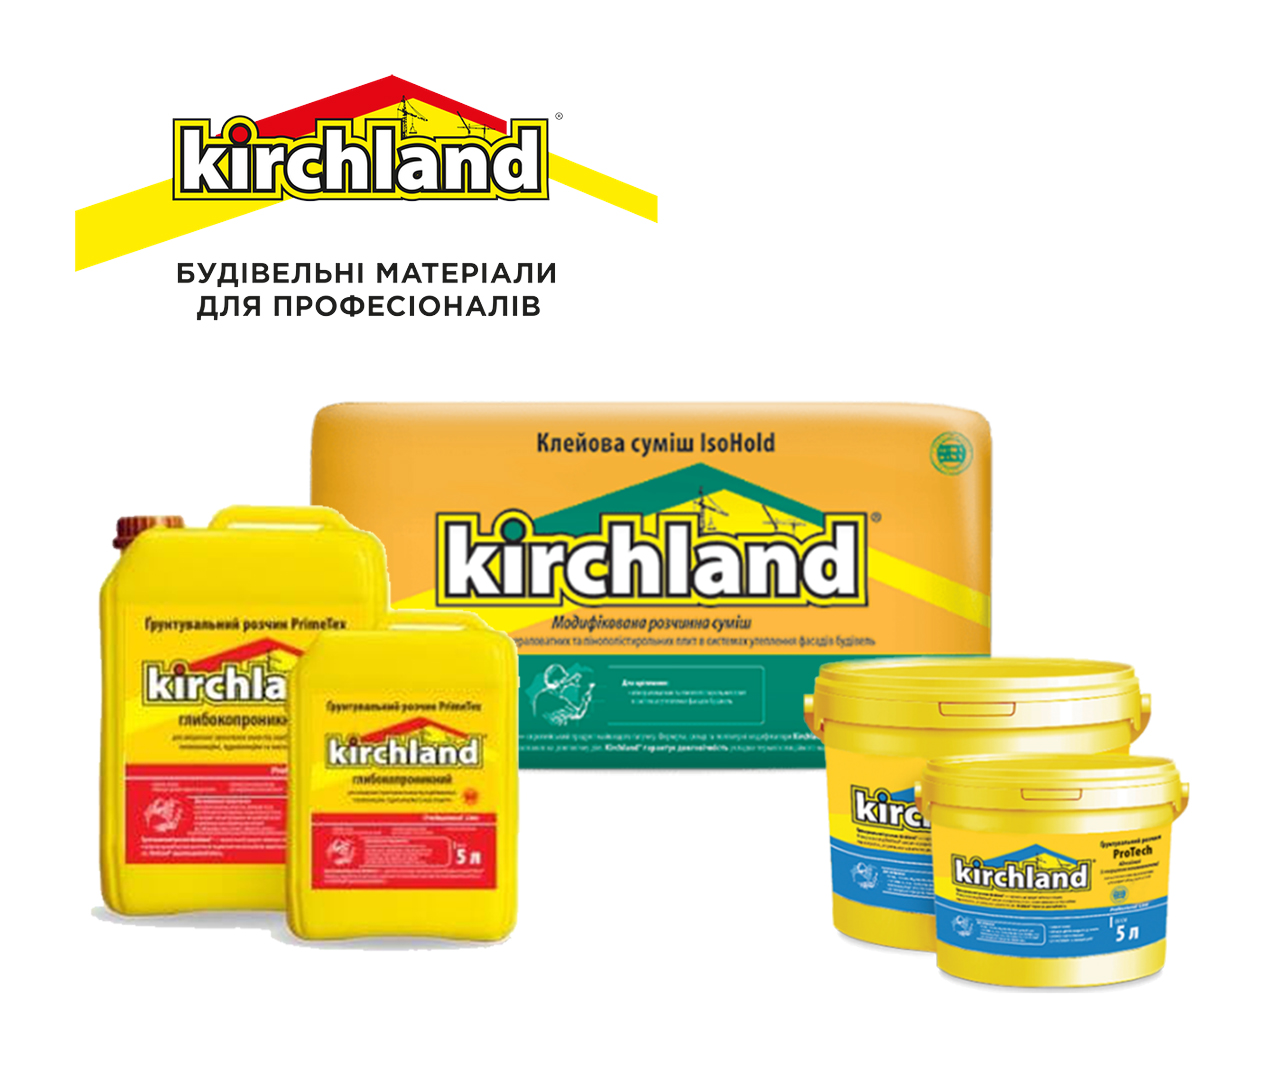 Kirchland